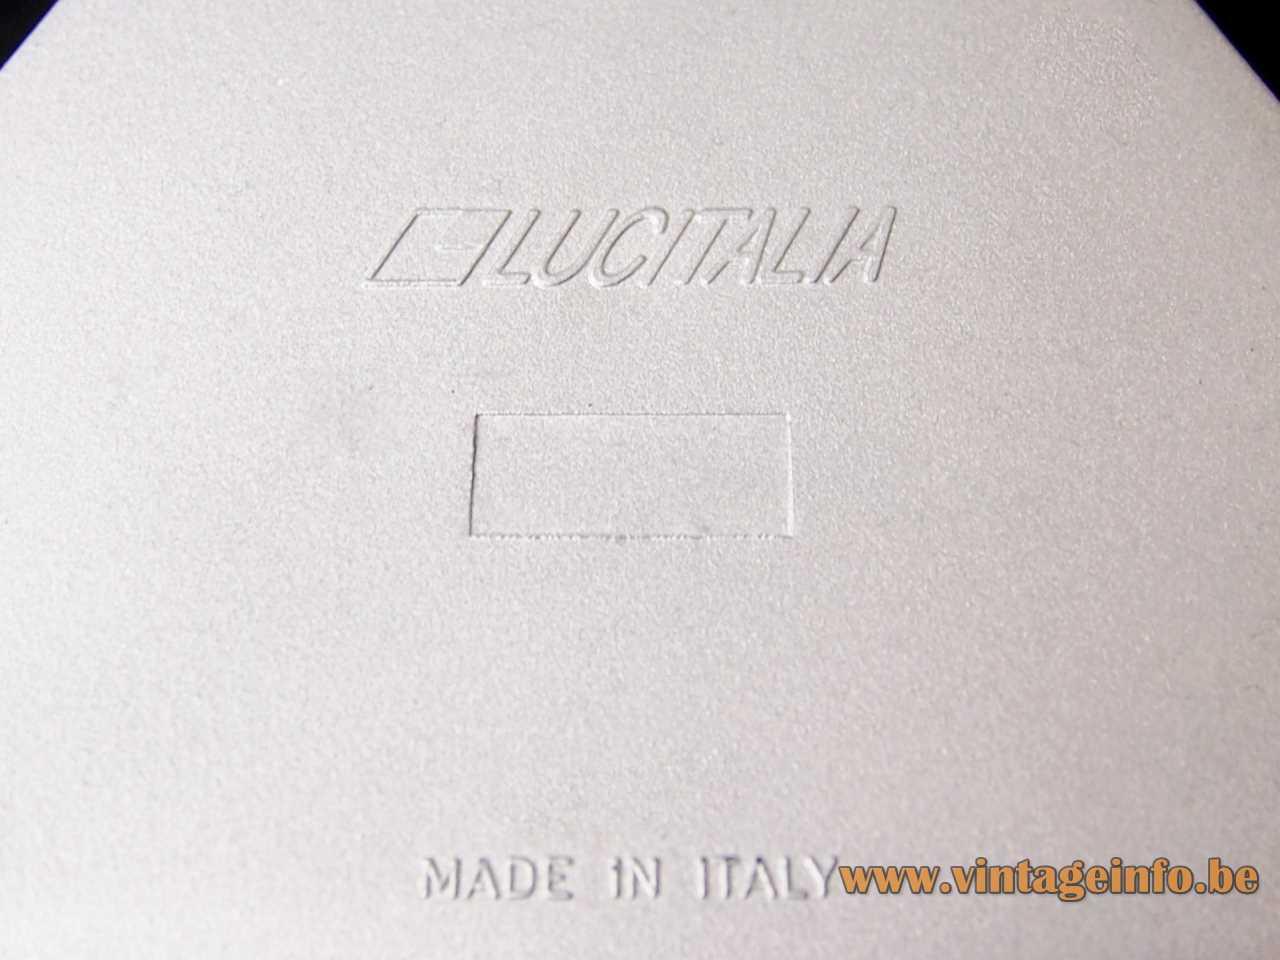 Lucitalia Kandido flush mount 1983 design: Ferdinand Alexander Porsche label logo 1980s Italy